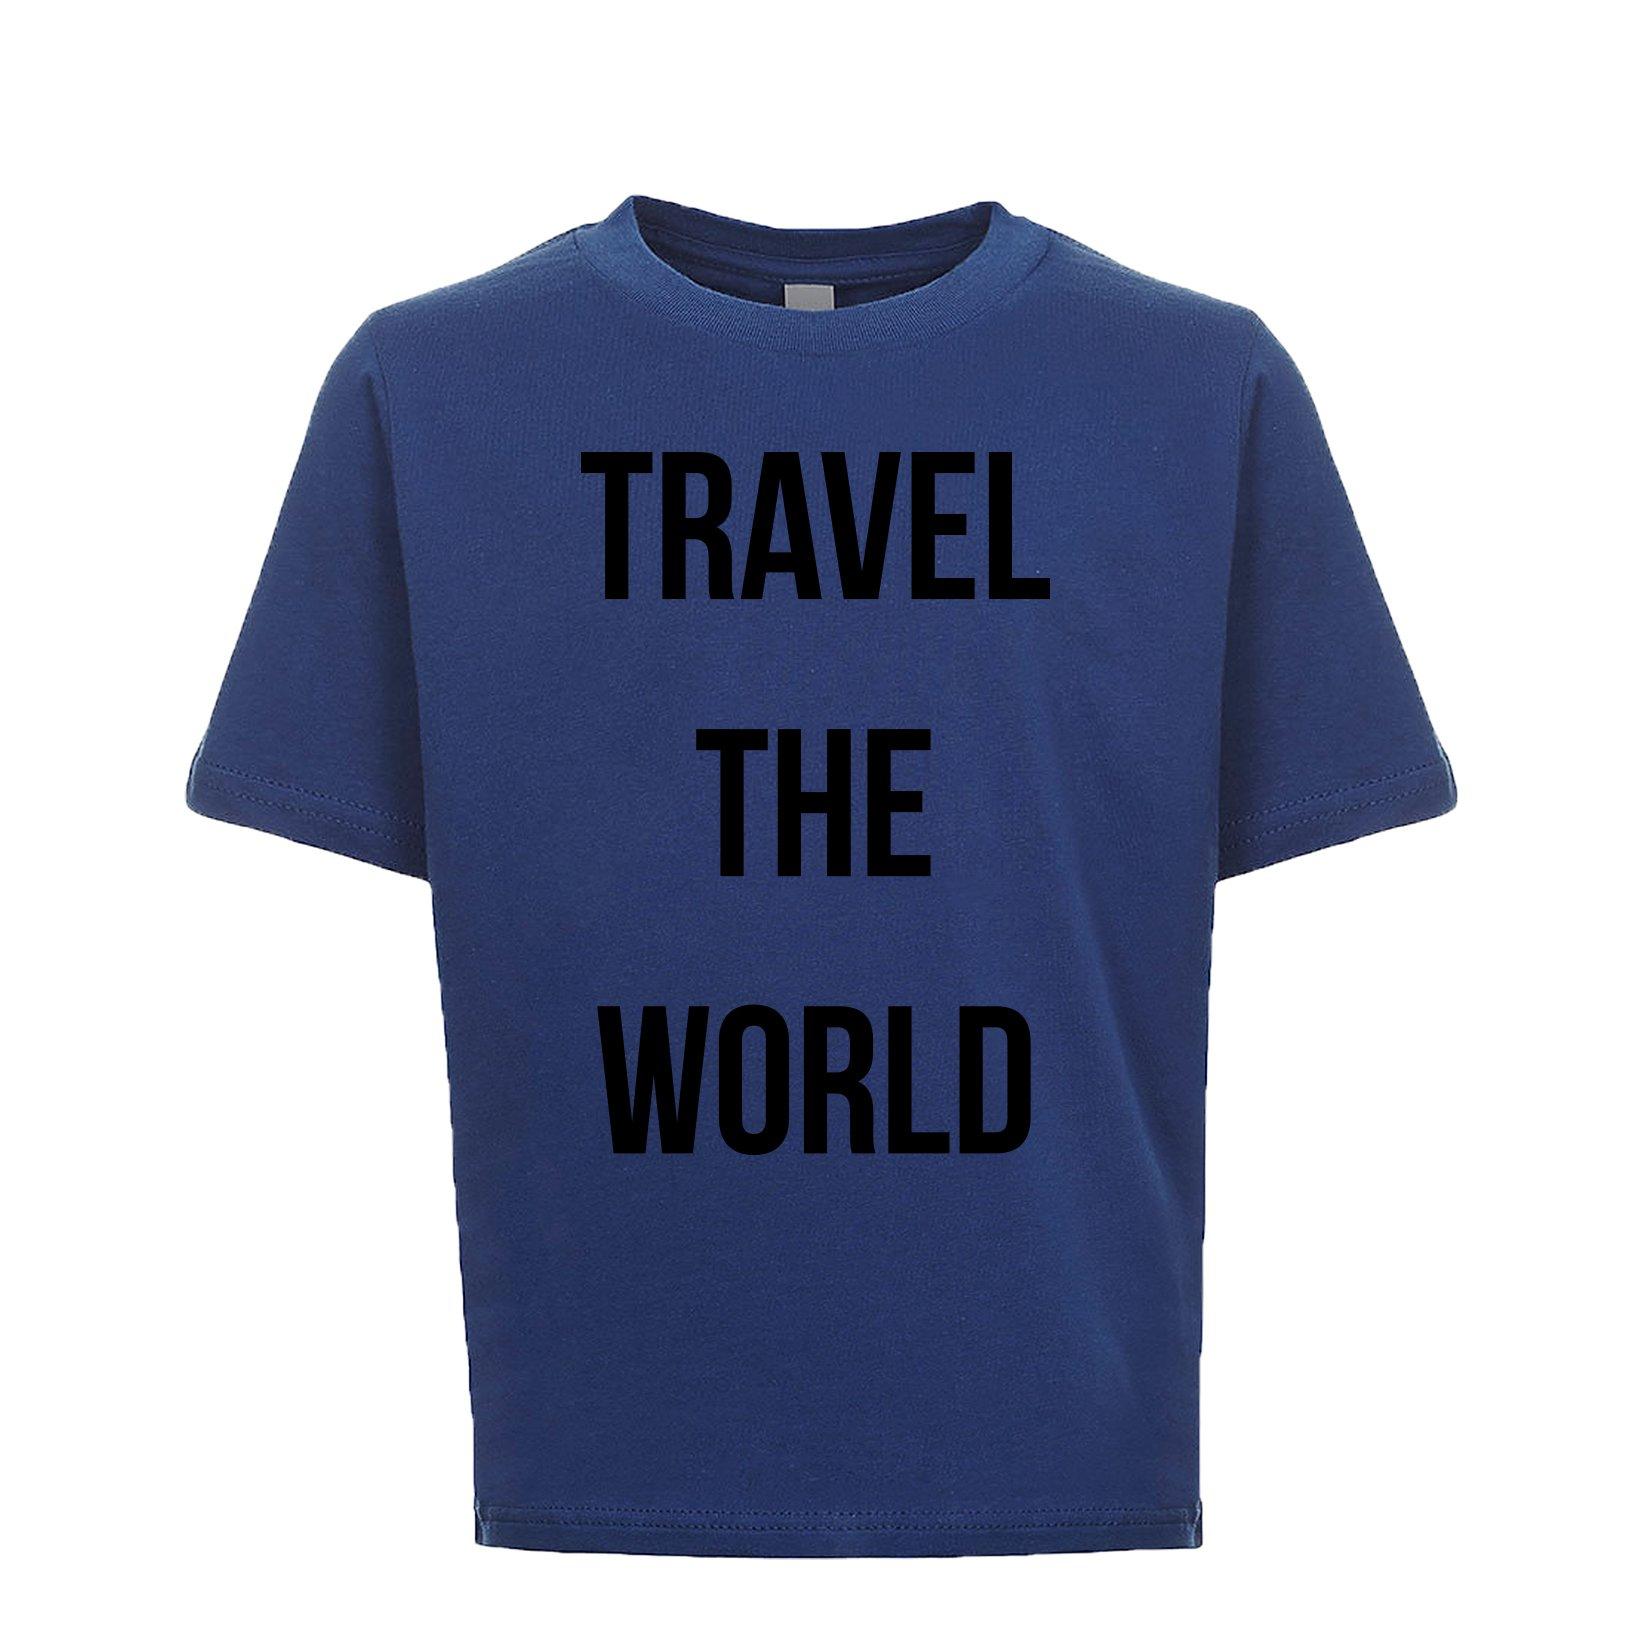 Travel The World Unisex Kids Tee Royal Small